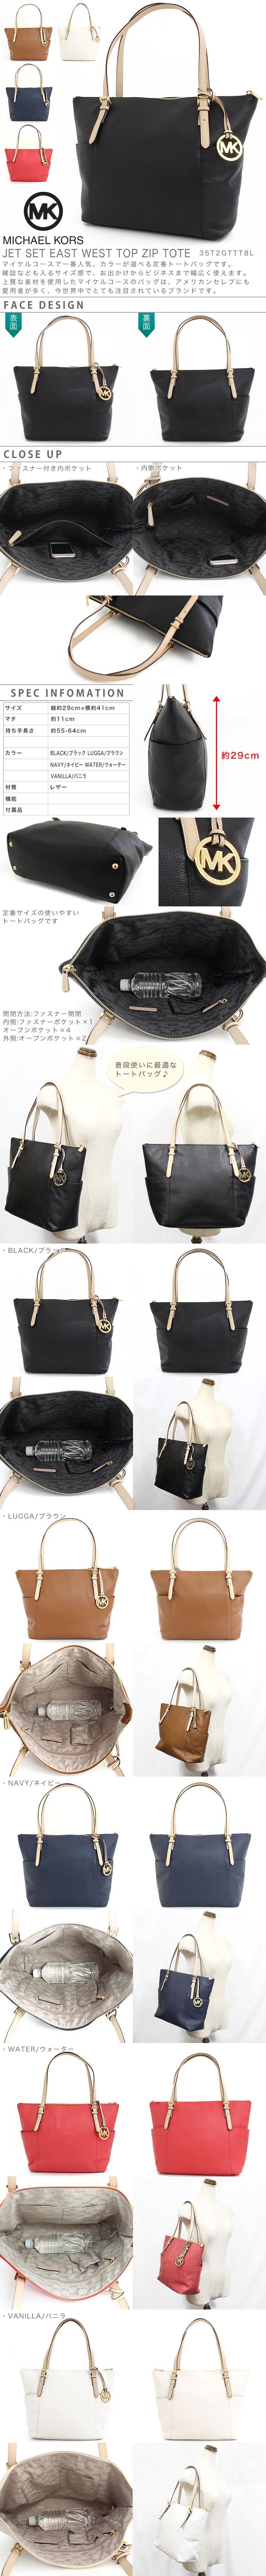 924bca2233 MKcollection  Michael Kors tote bag women s MICHAEL KORS bag casual ...